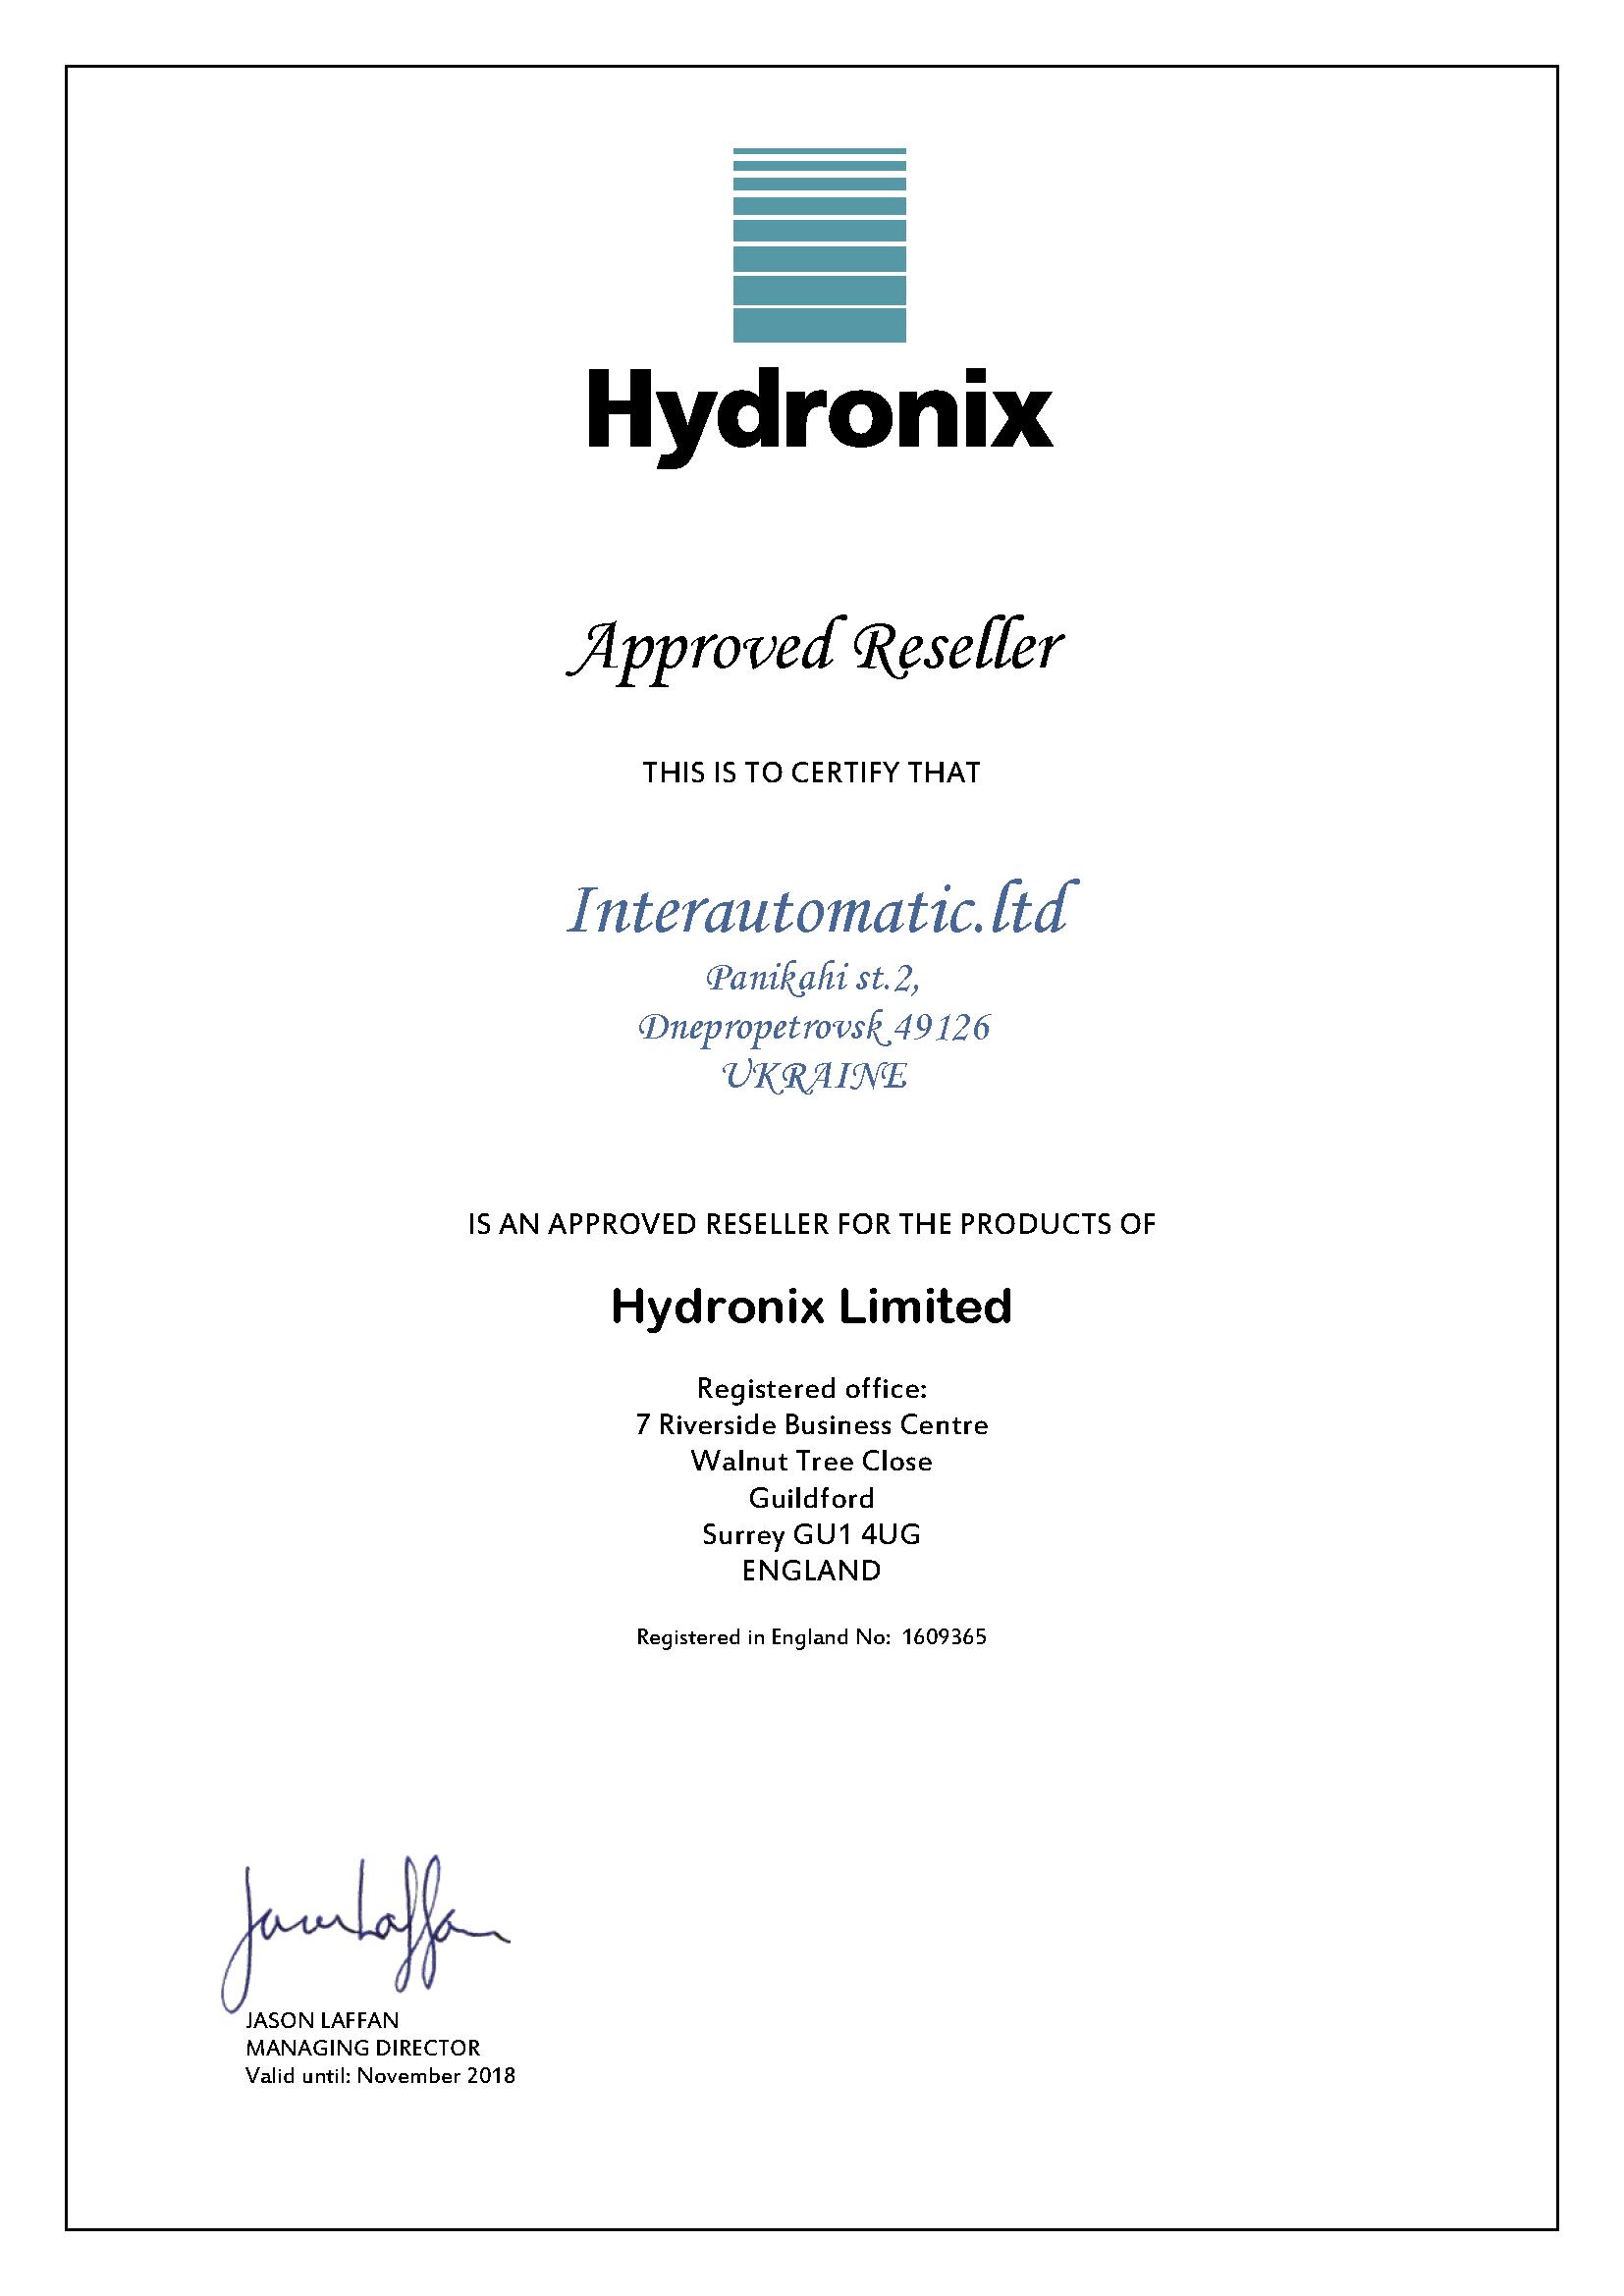 Сертификат торговли Hydronix - Интеравтоматика